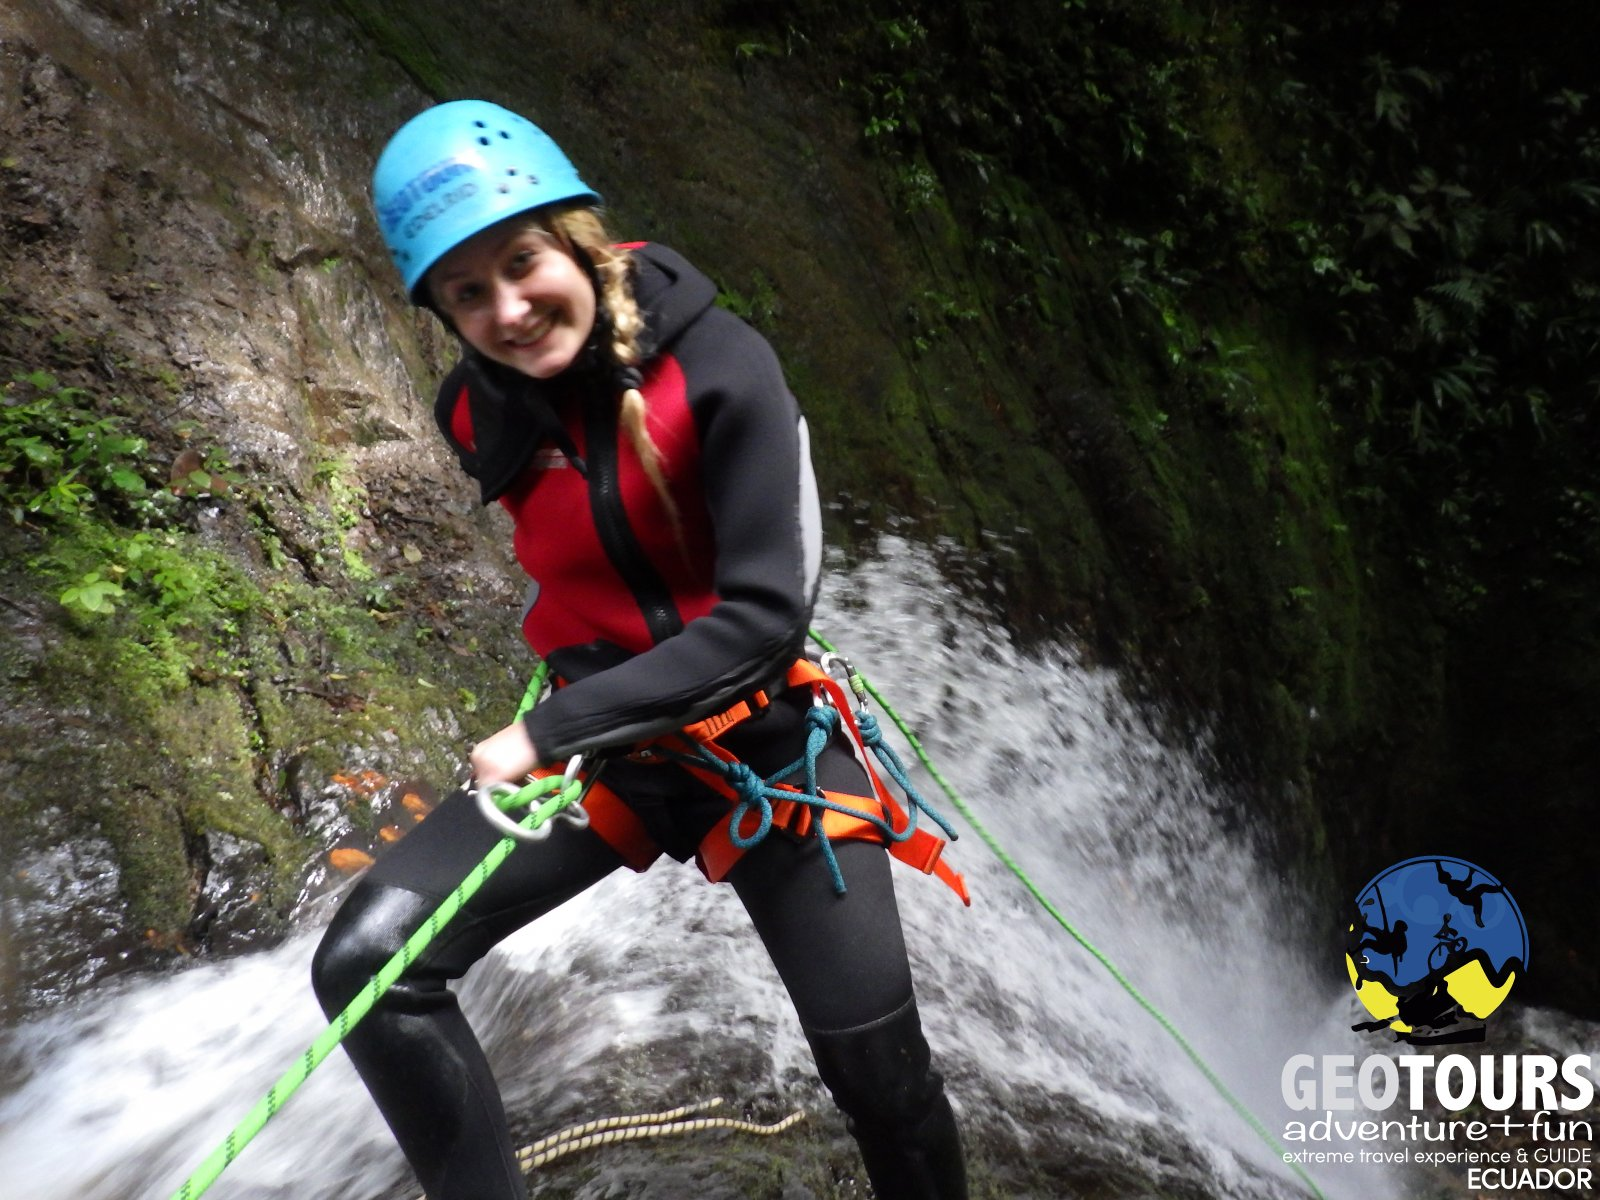 Geotours Baños Ecuador